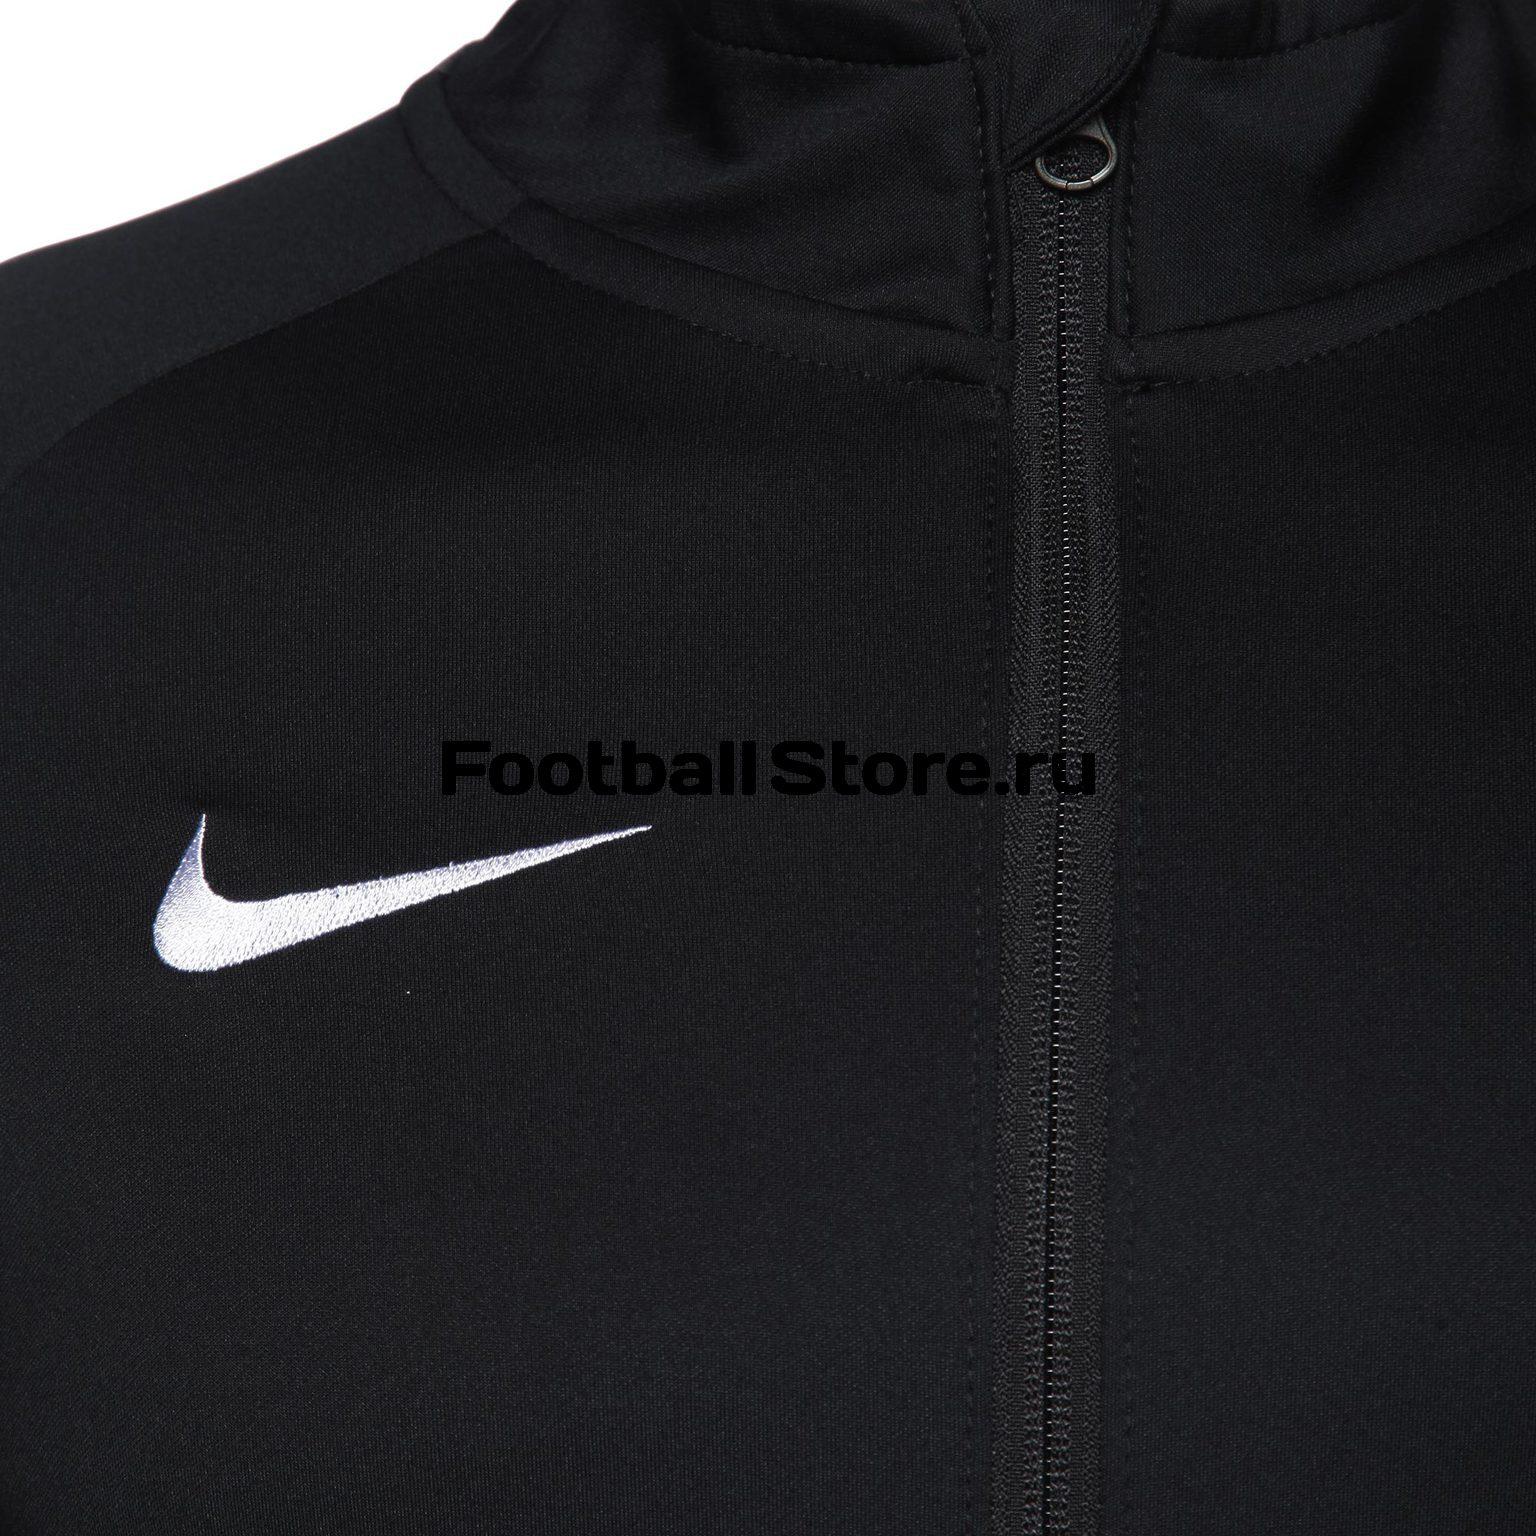 714b96a1 Олимпийка Nike Dry Academy18 893701-010 – купить в интернет магазине ...